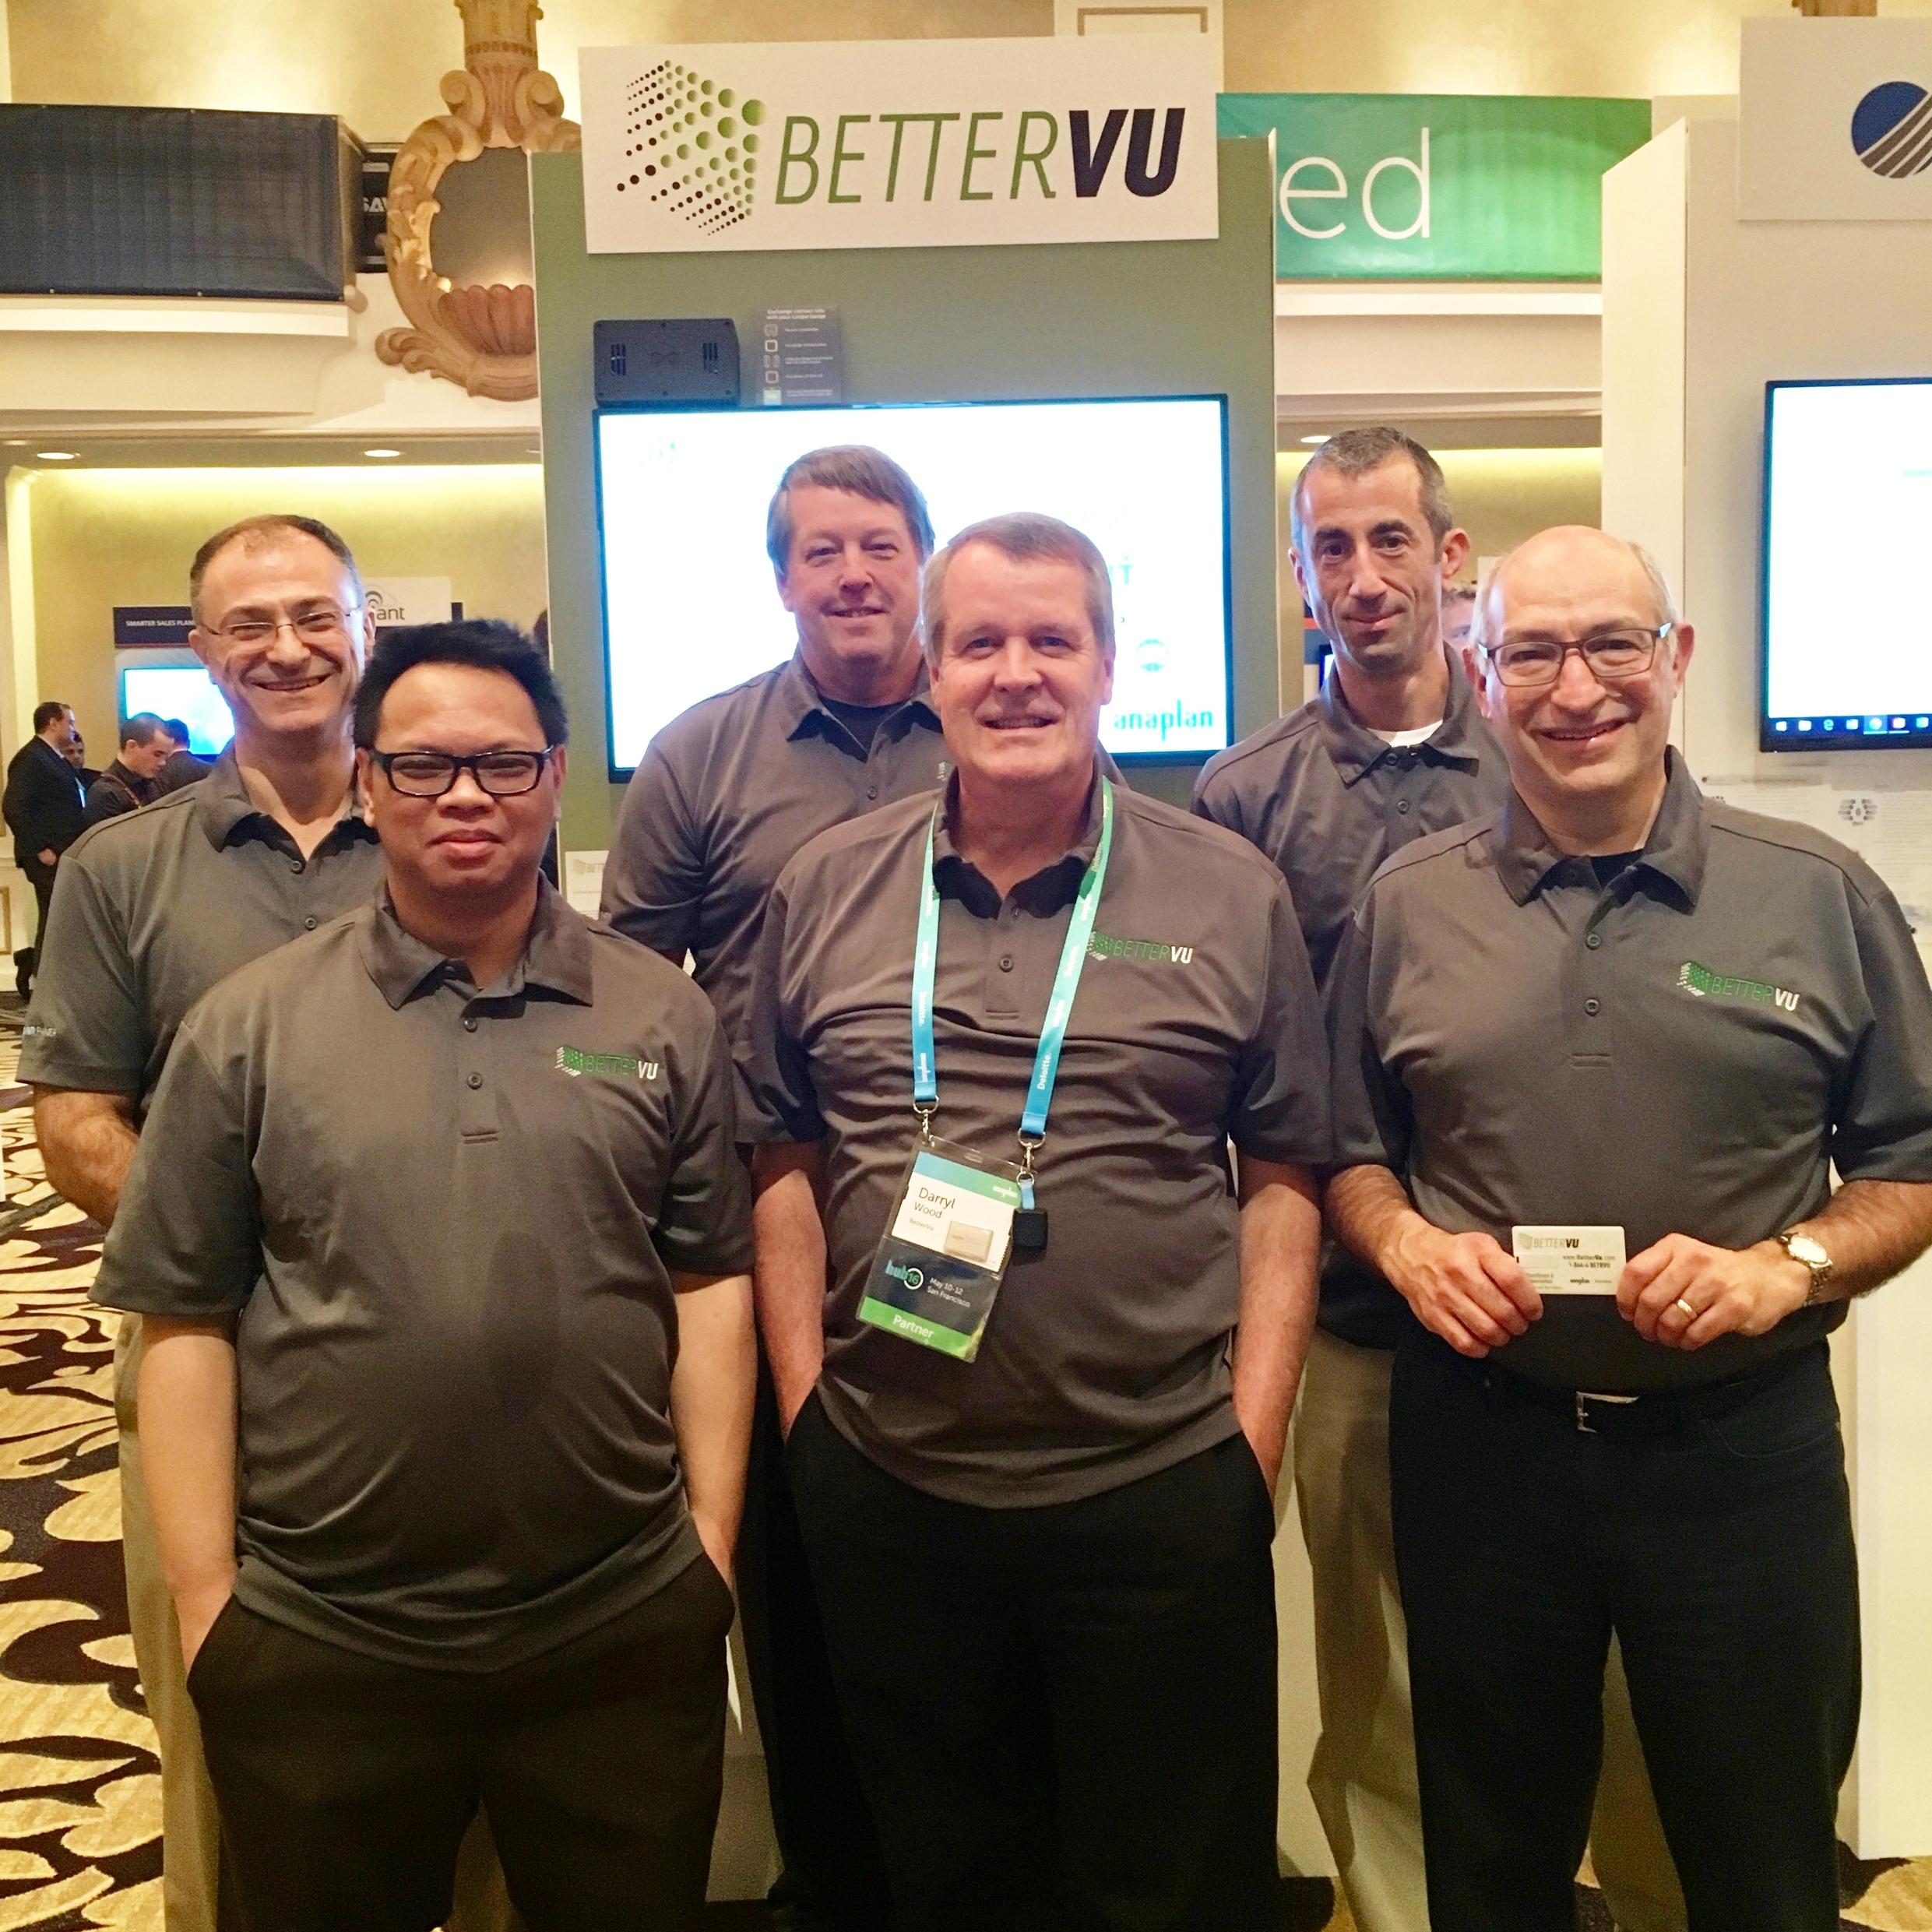 Members of Team BetterVu @ Anaplan Hub16